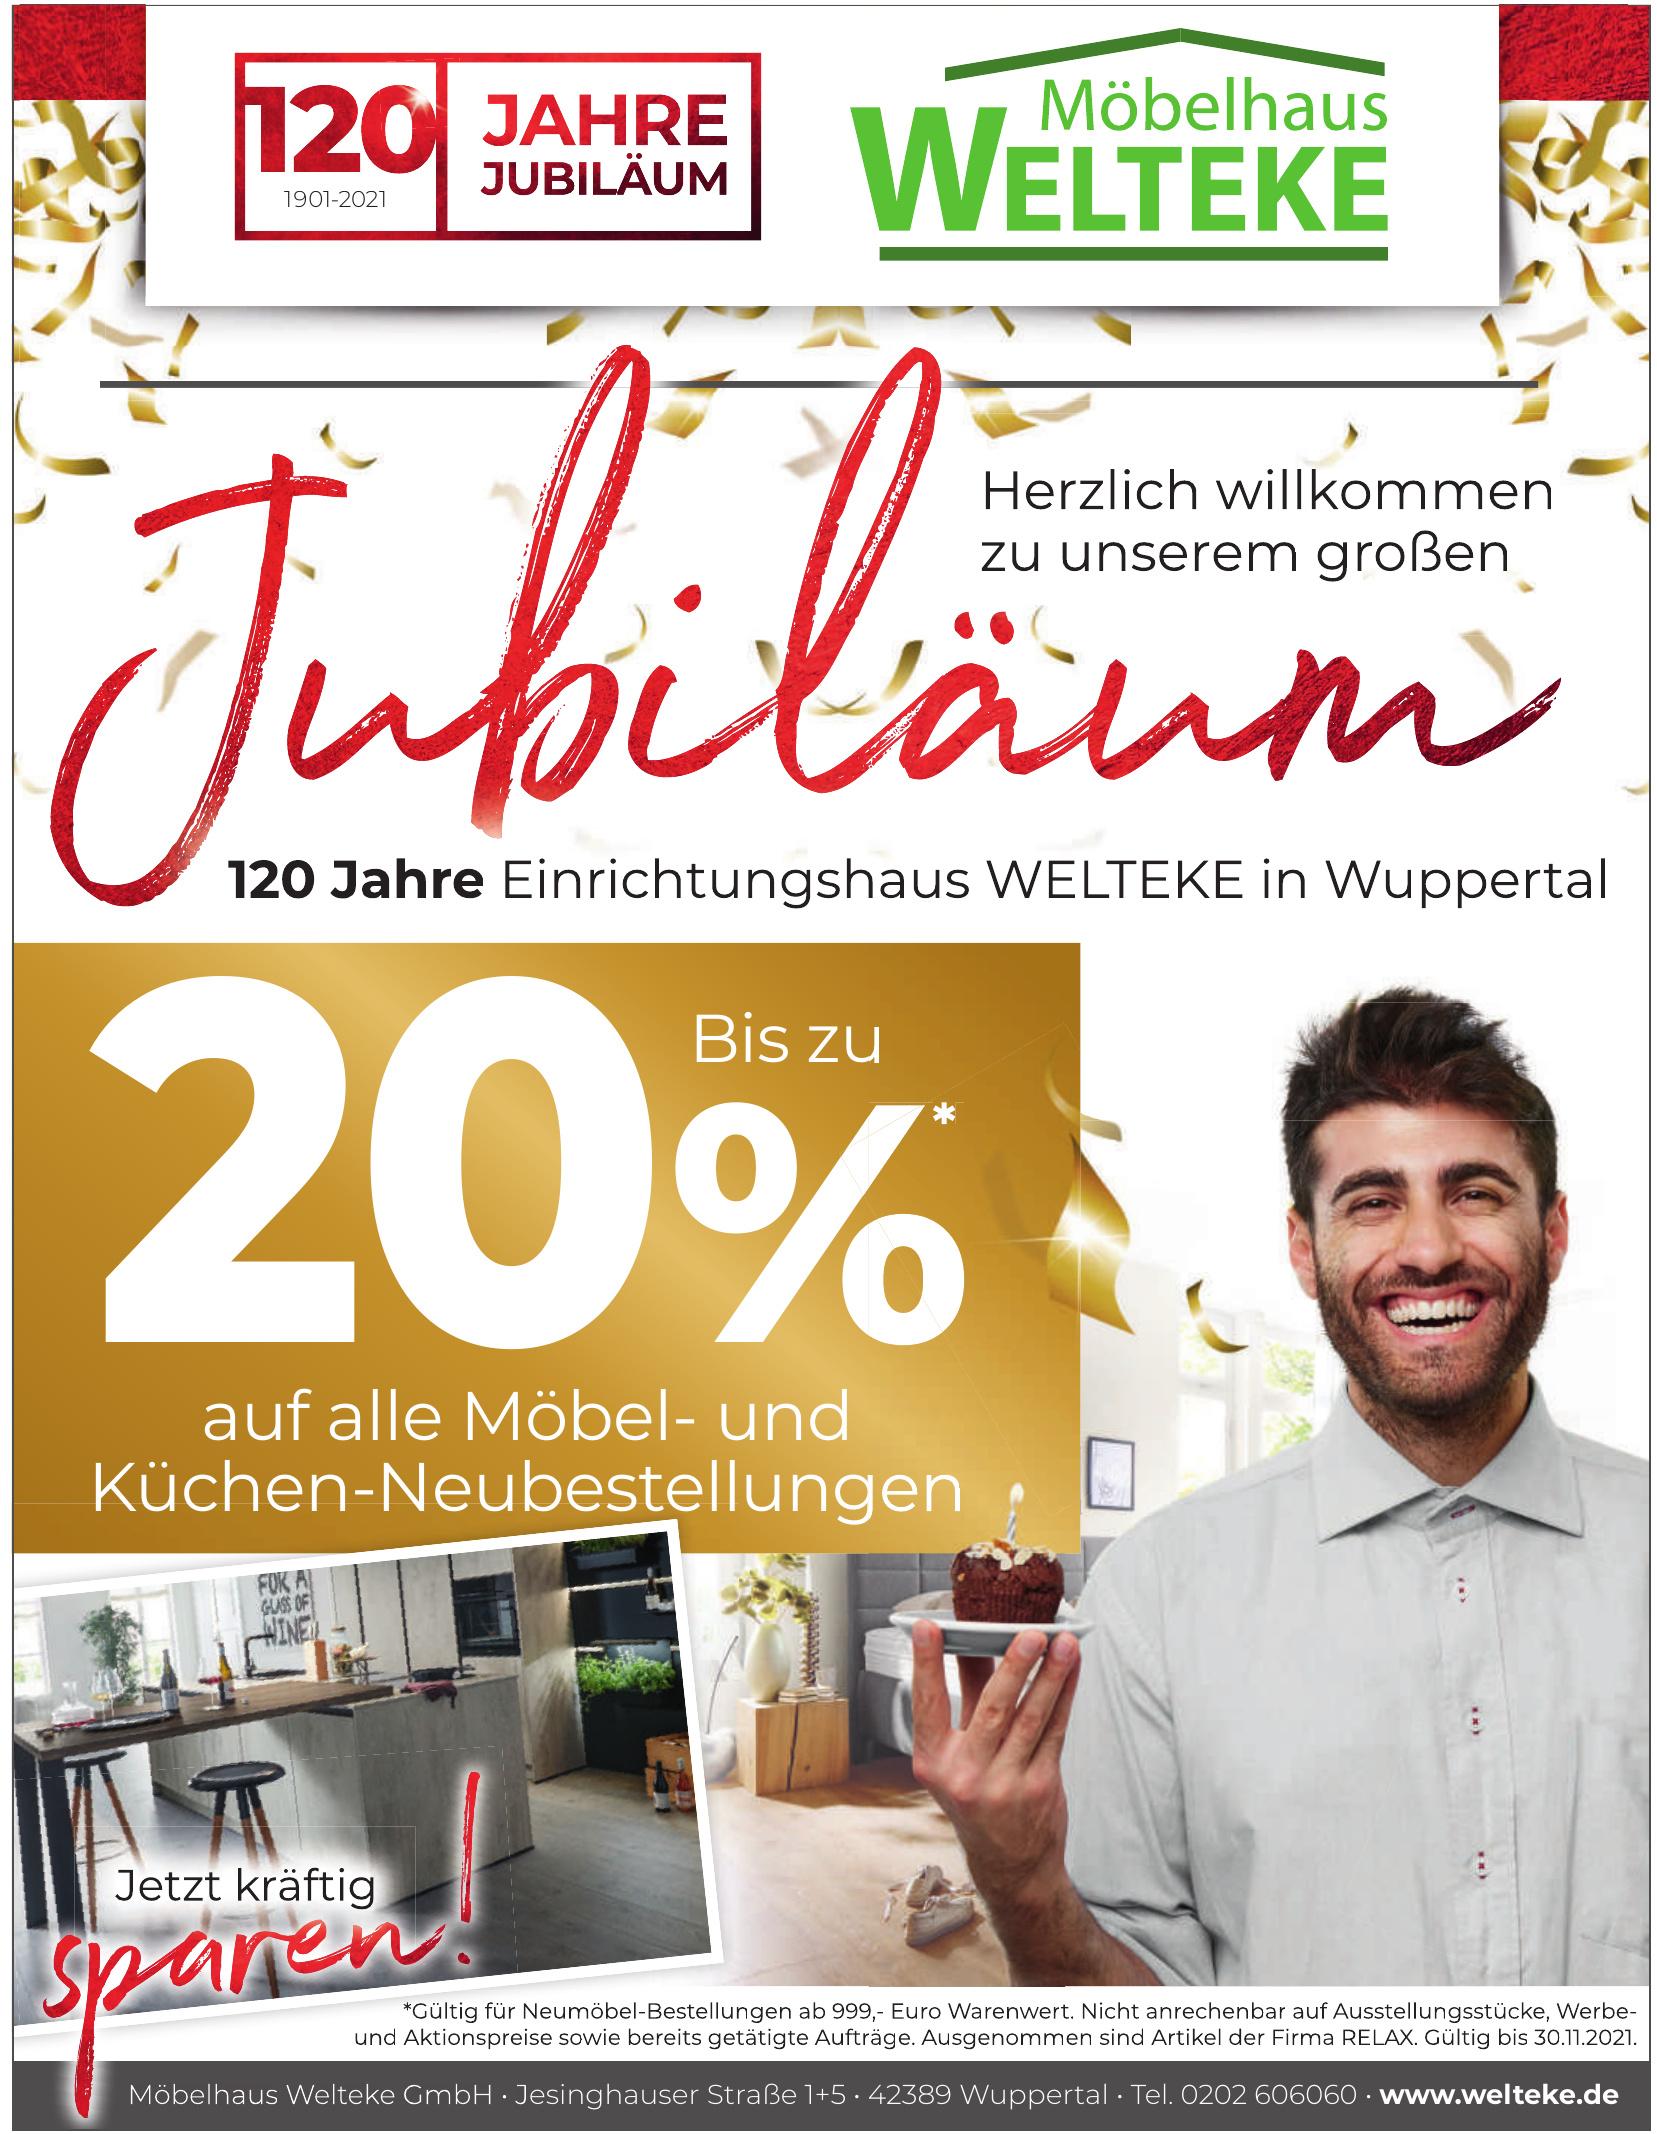 Möbelhaus Welteke GmbH